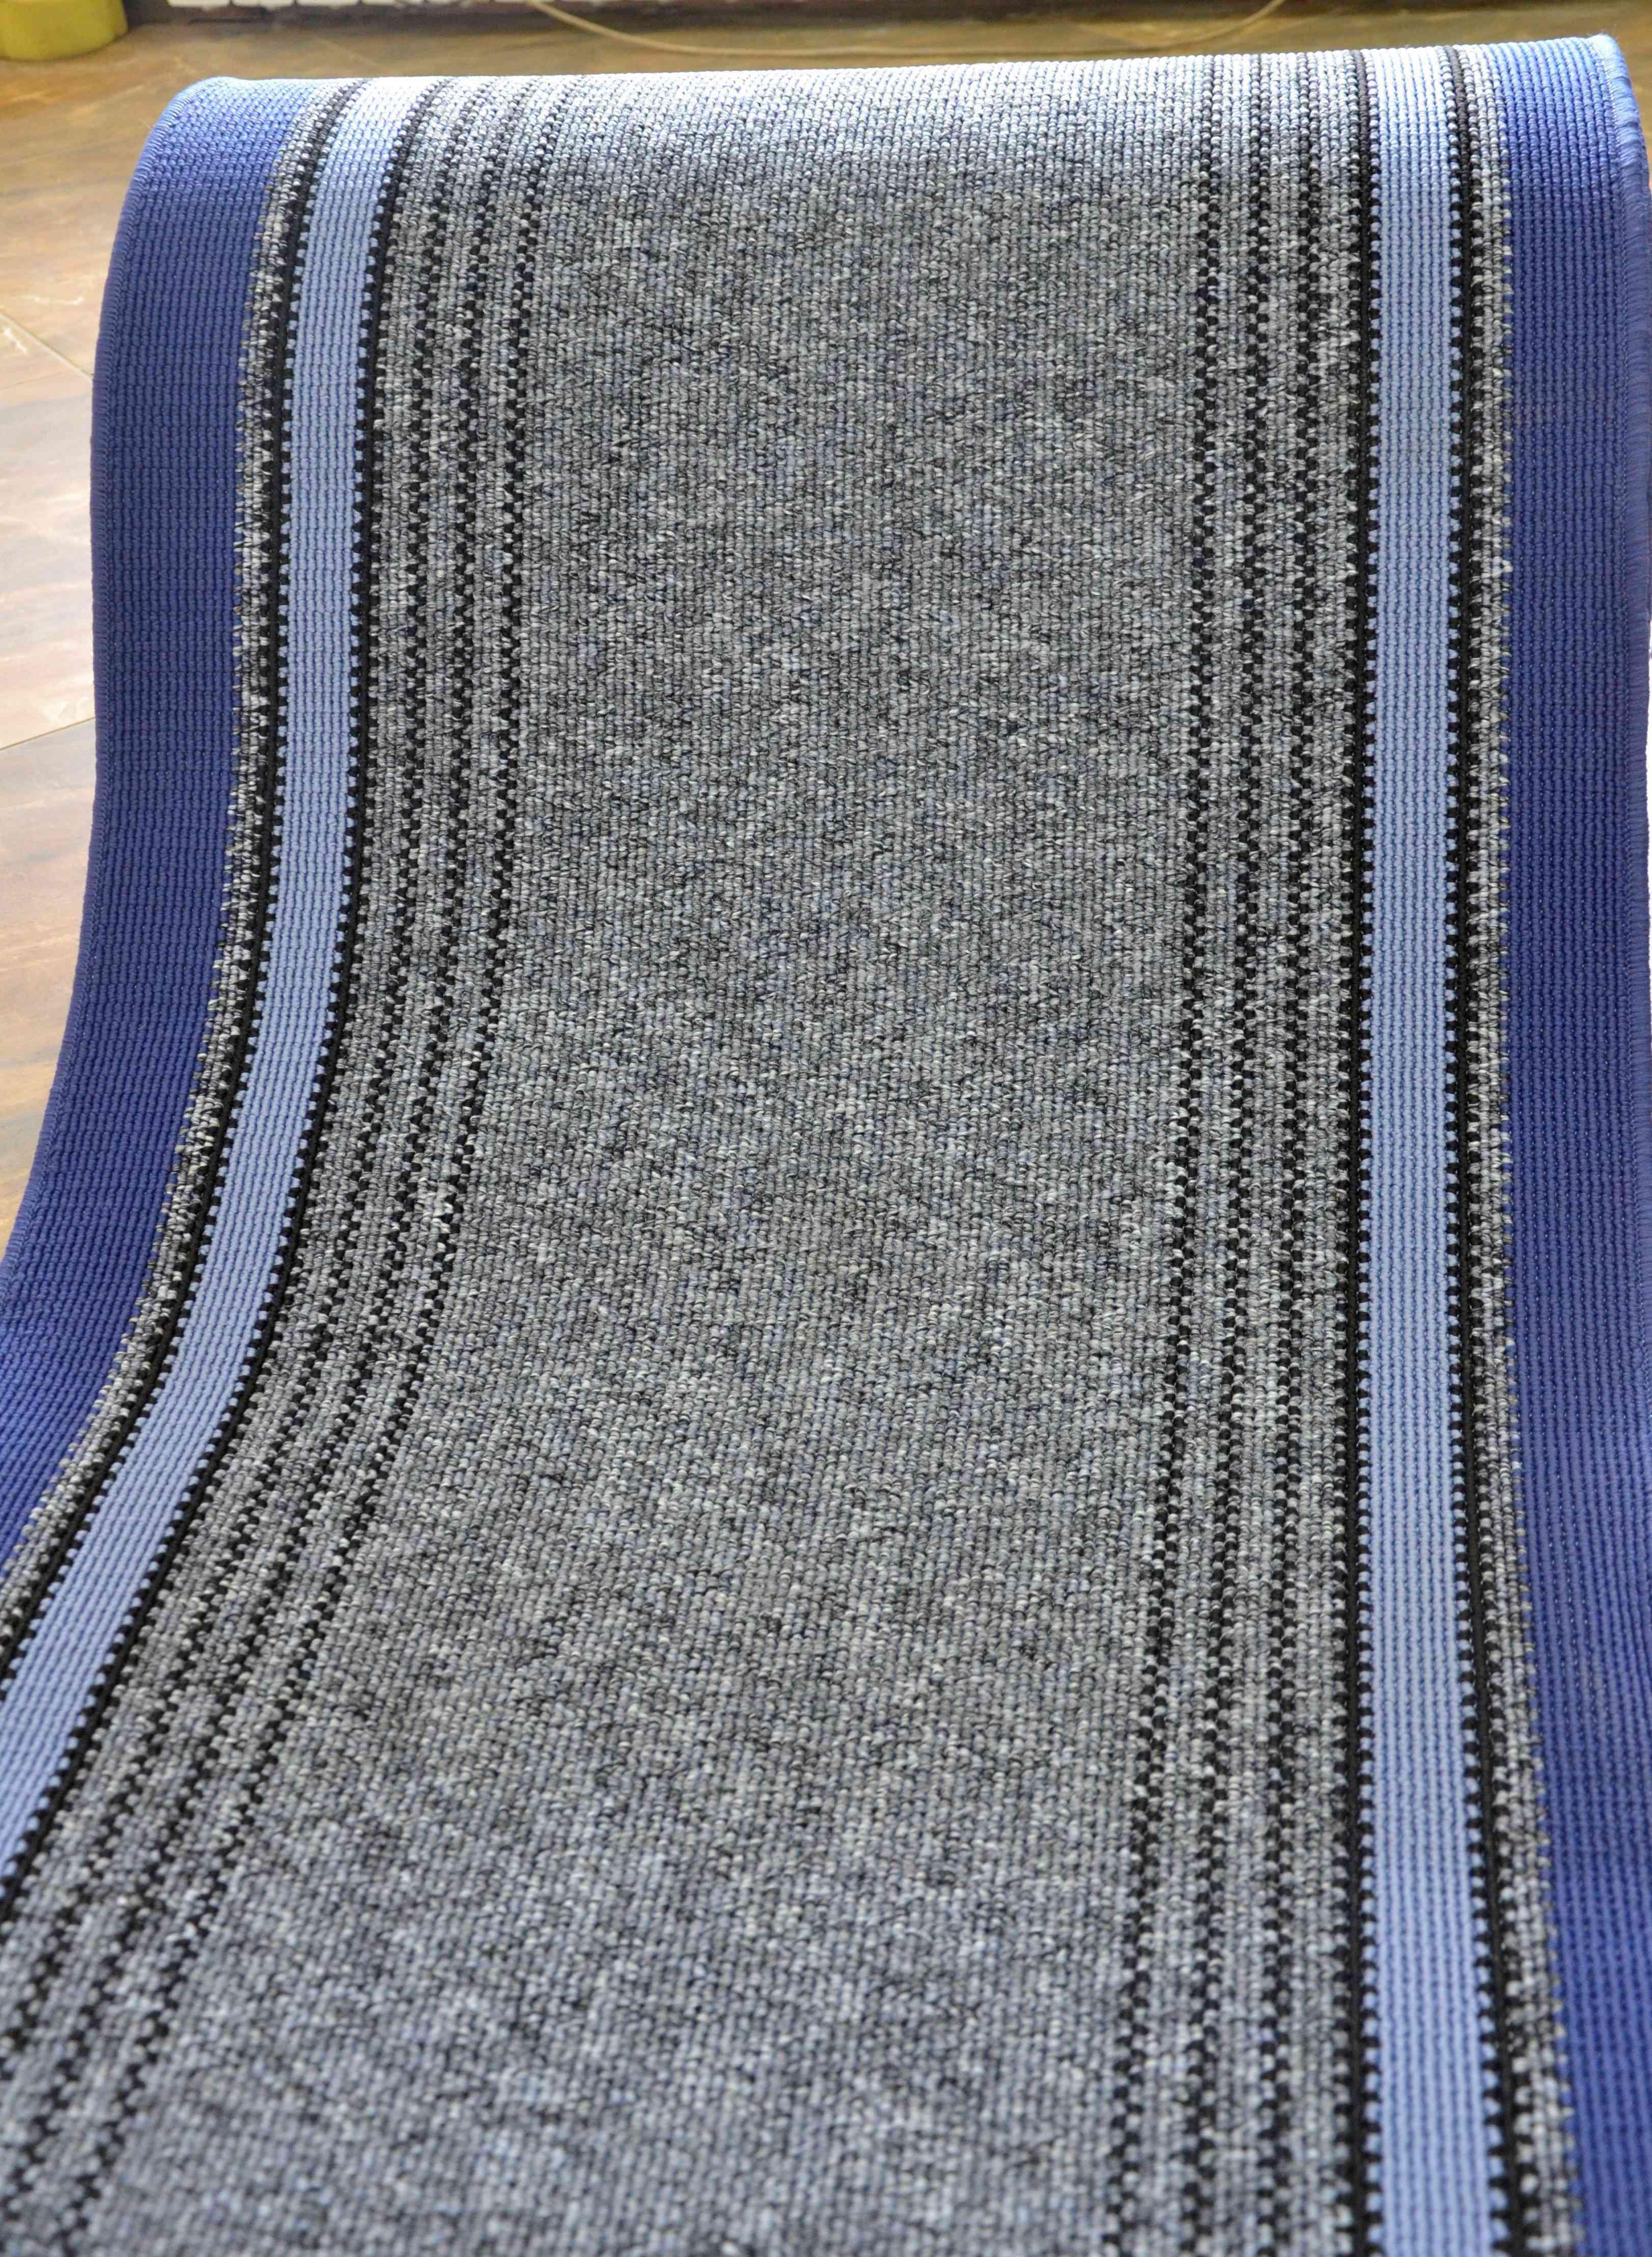 Traversa Covor, Saba 08, Albastru, 100x1000 cm, 1350 gr/mp, 1x10 m 3